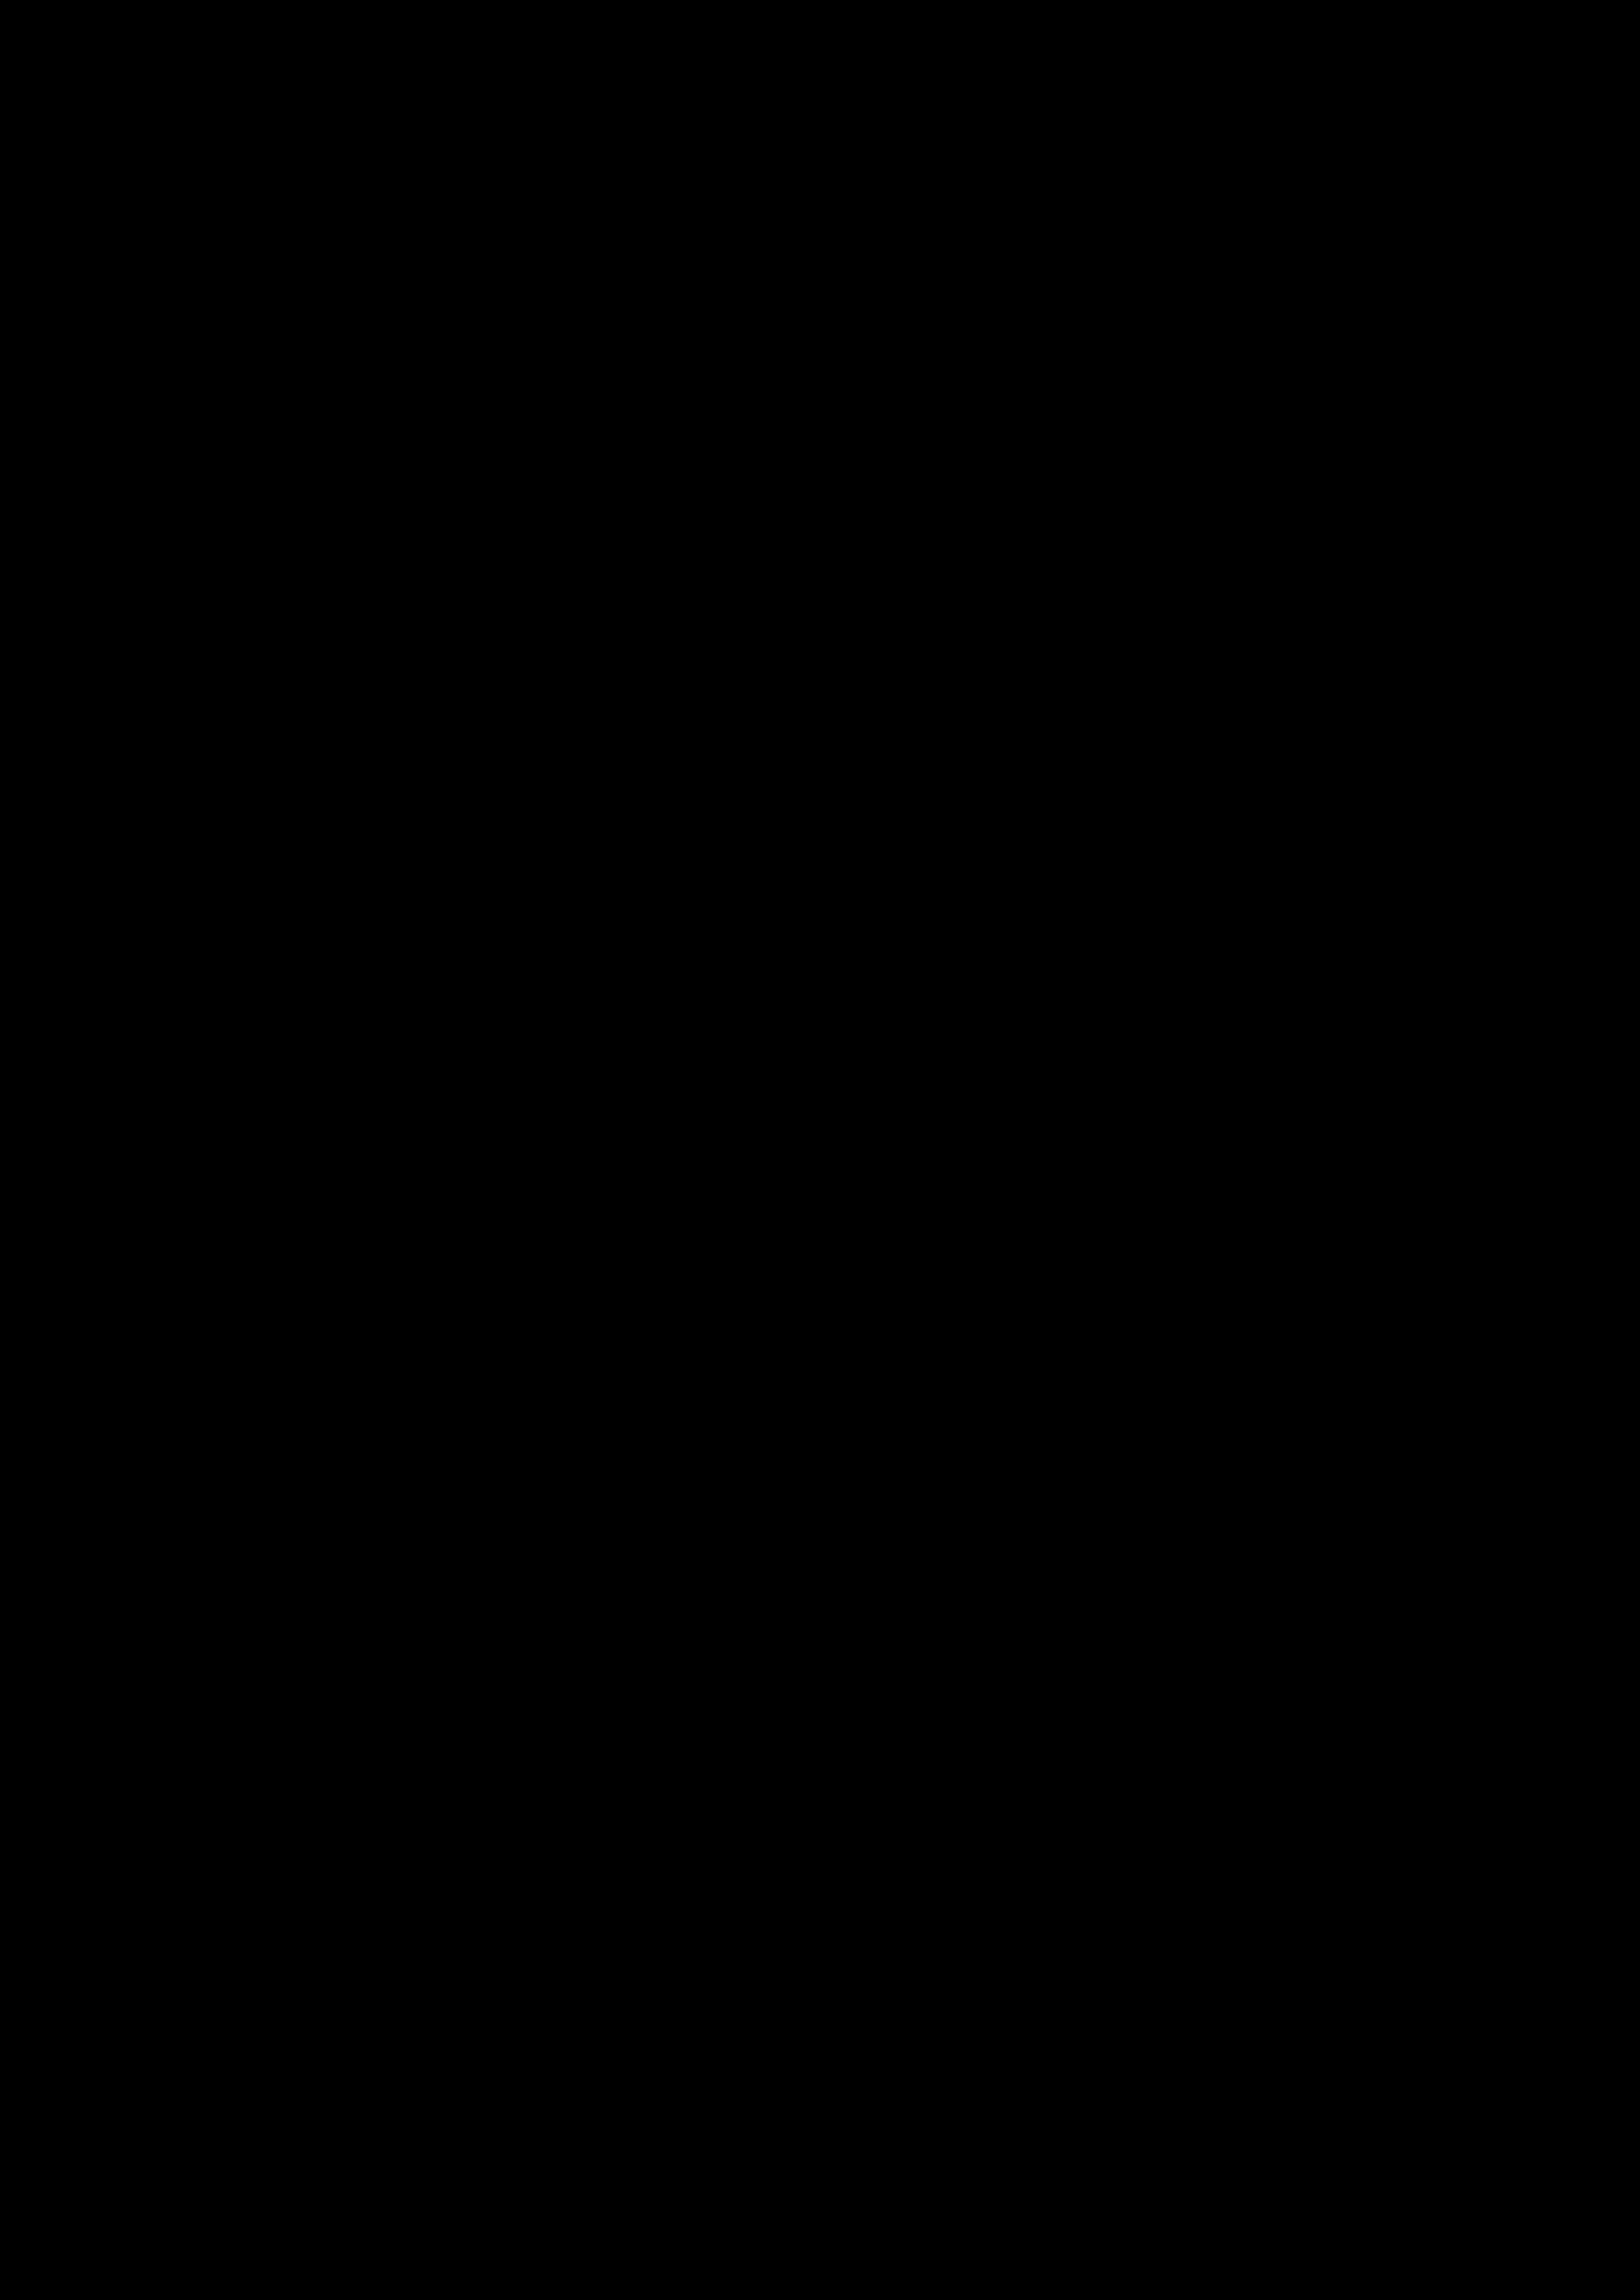 BH184_-3